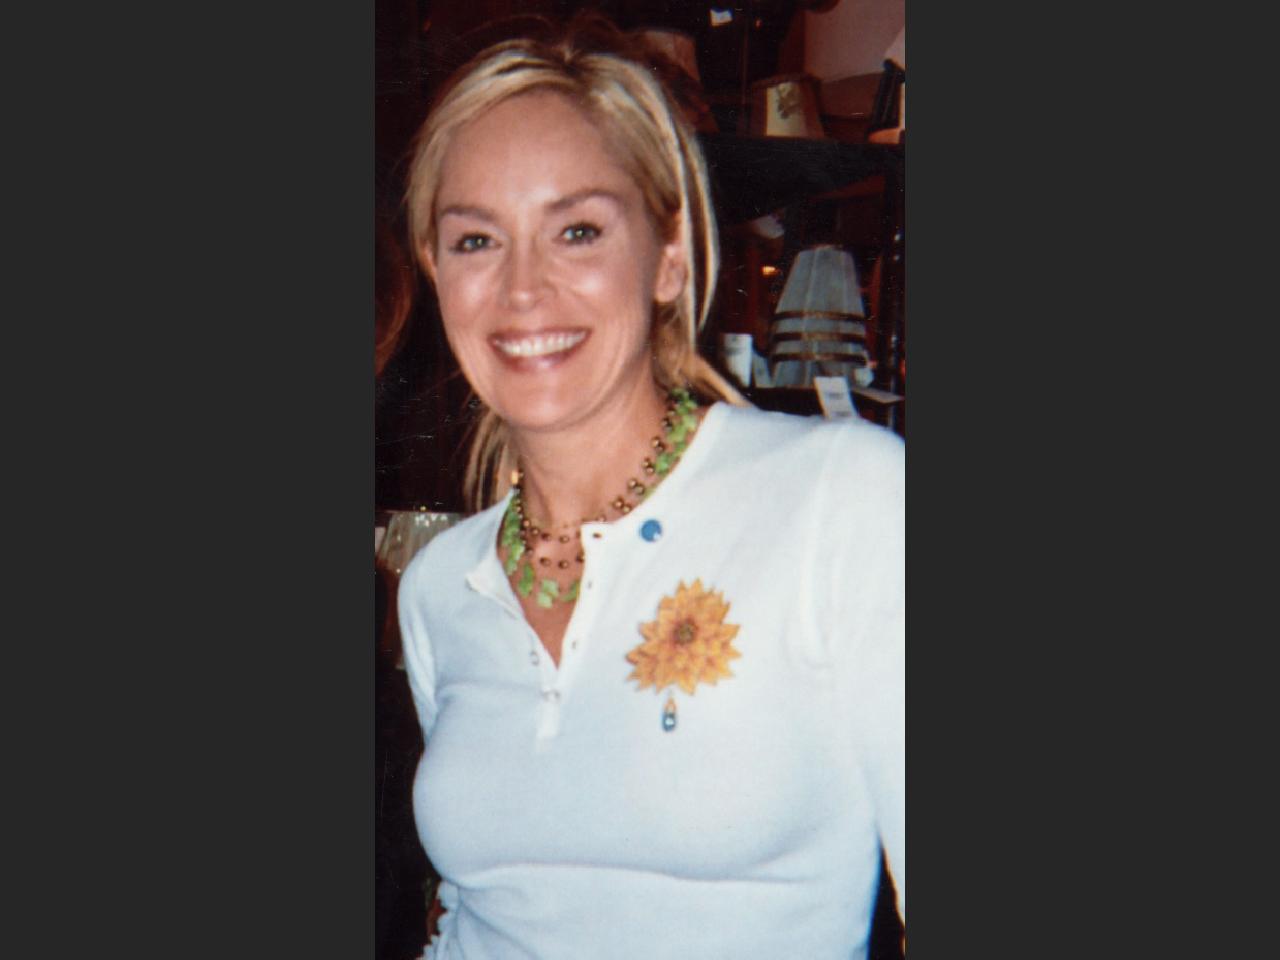 Sharon Stone, actress